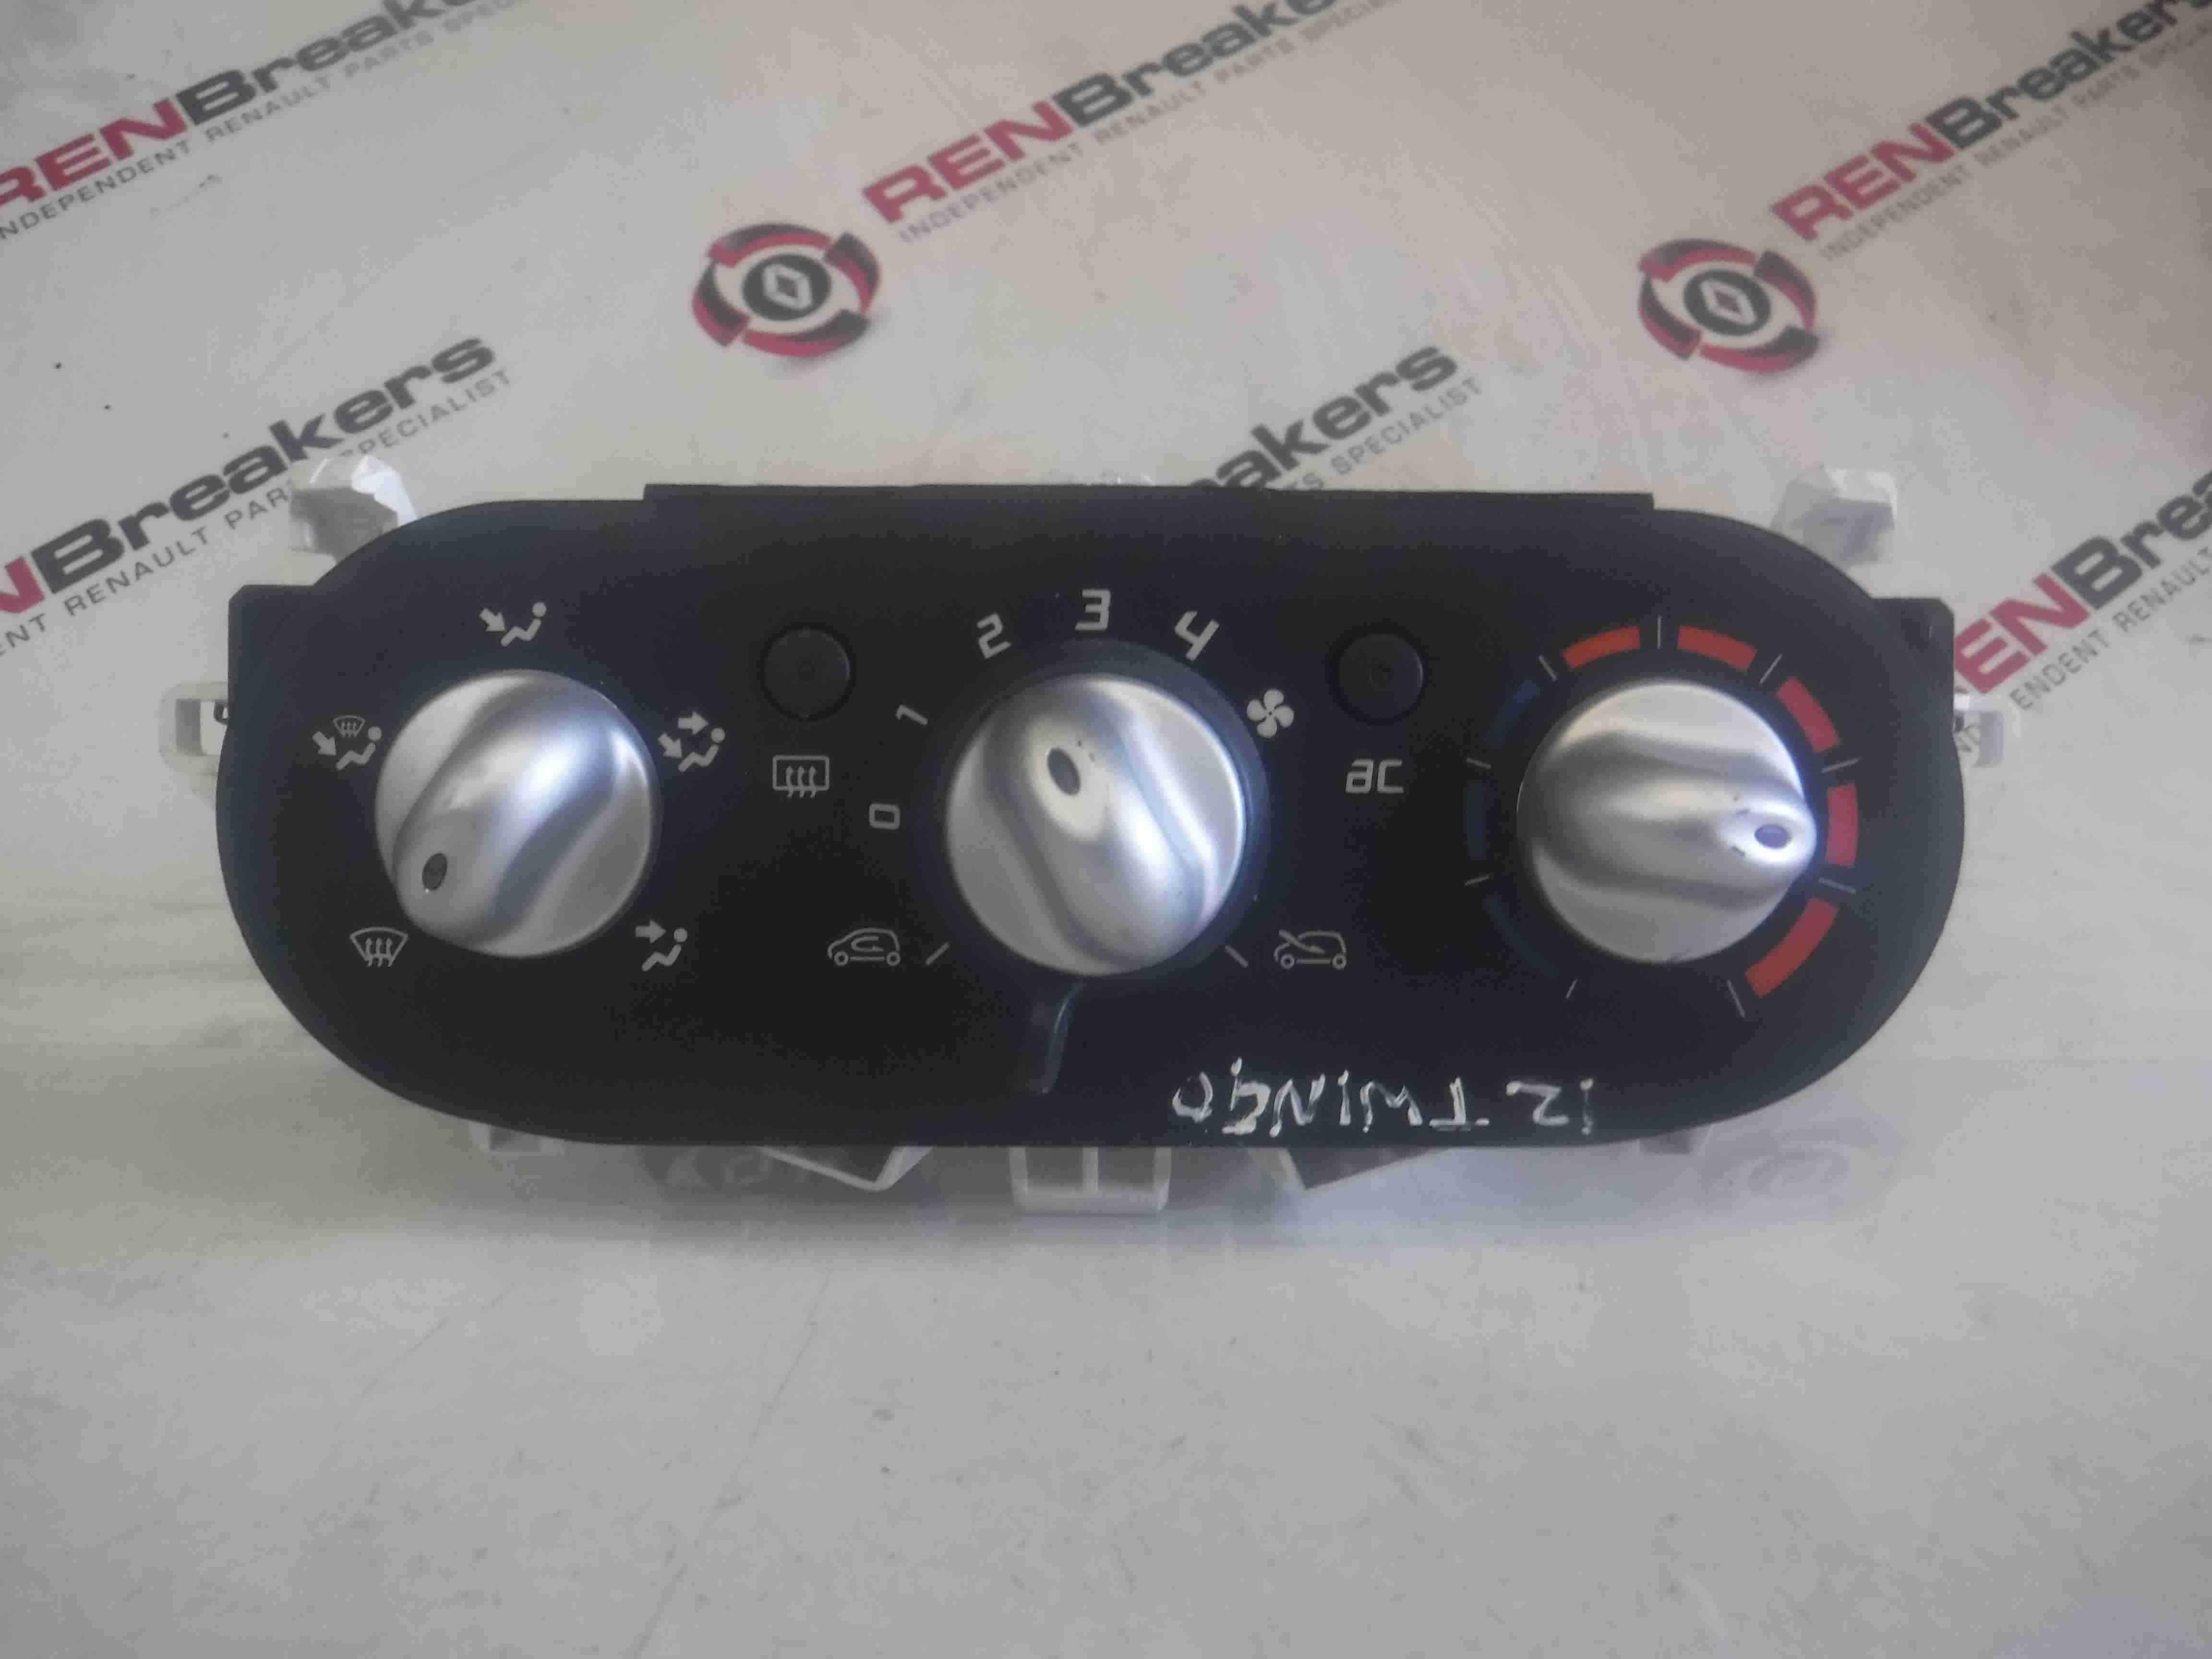 Renault Twingo 2011-2014 Heater Controls Dials